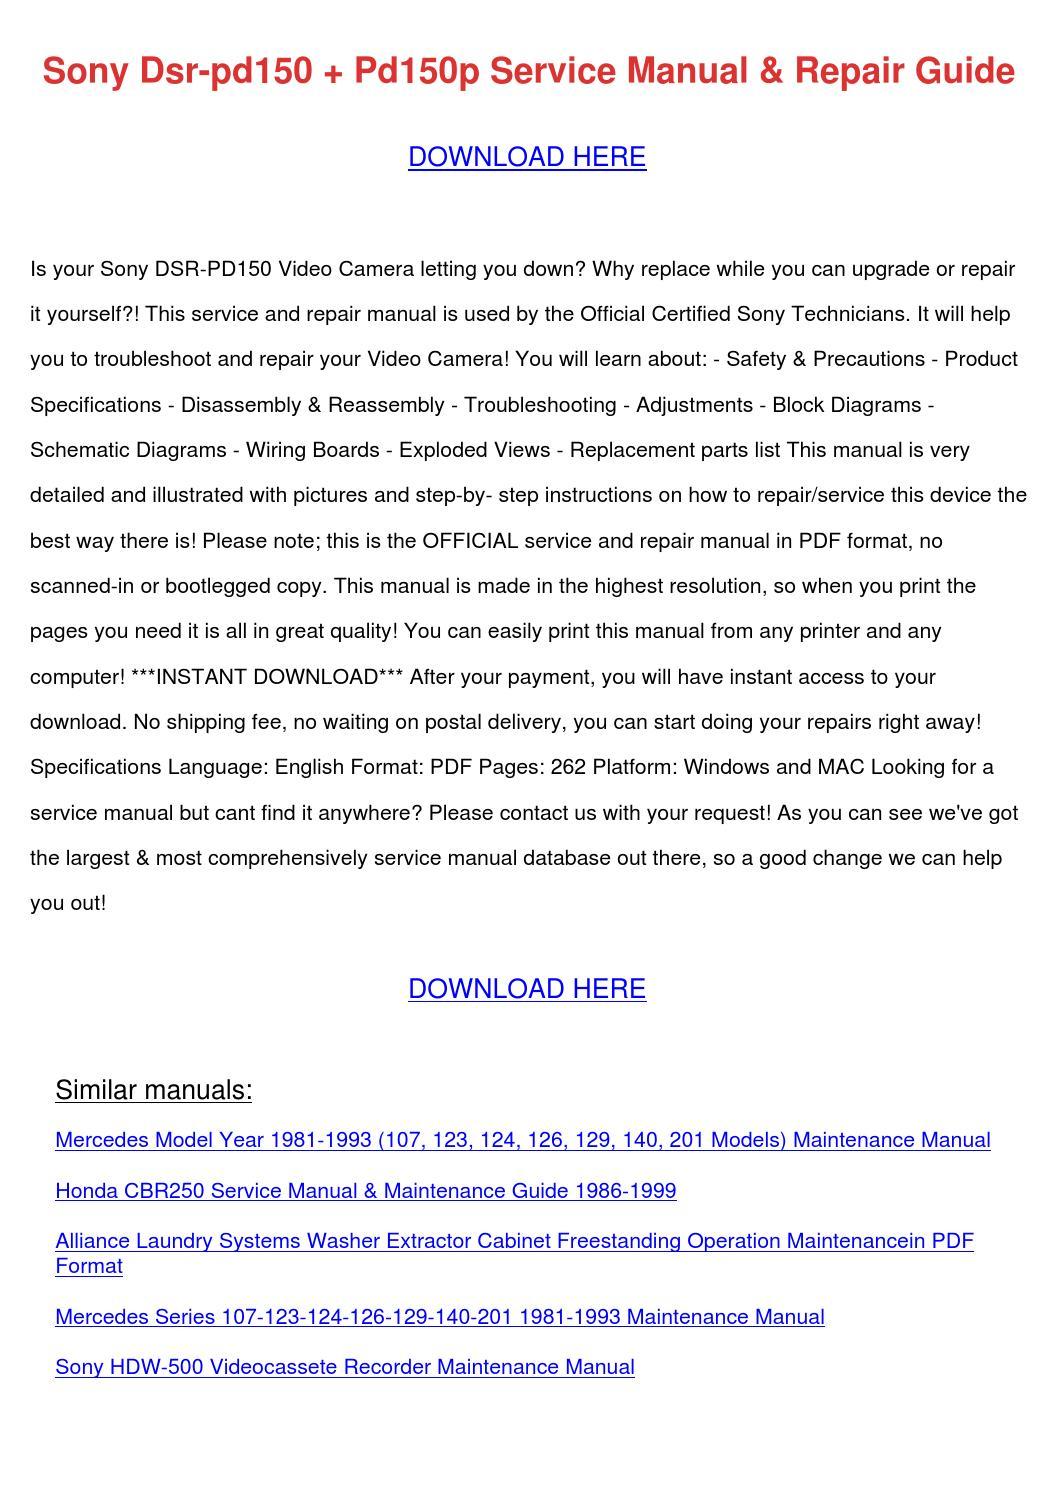 2004 Dodge Neon Srt 4 Workshop Service Repair Manual